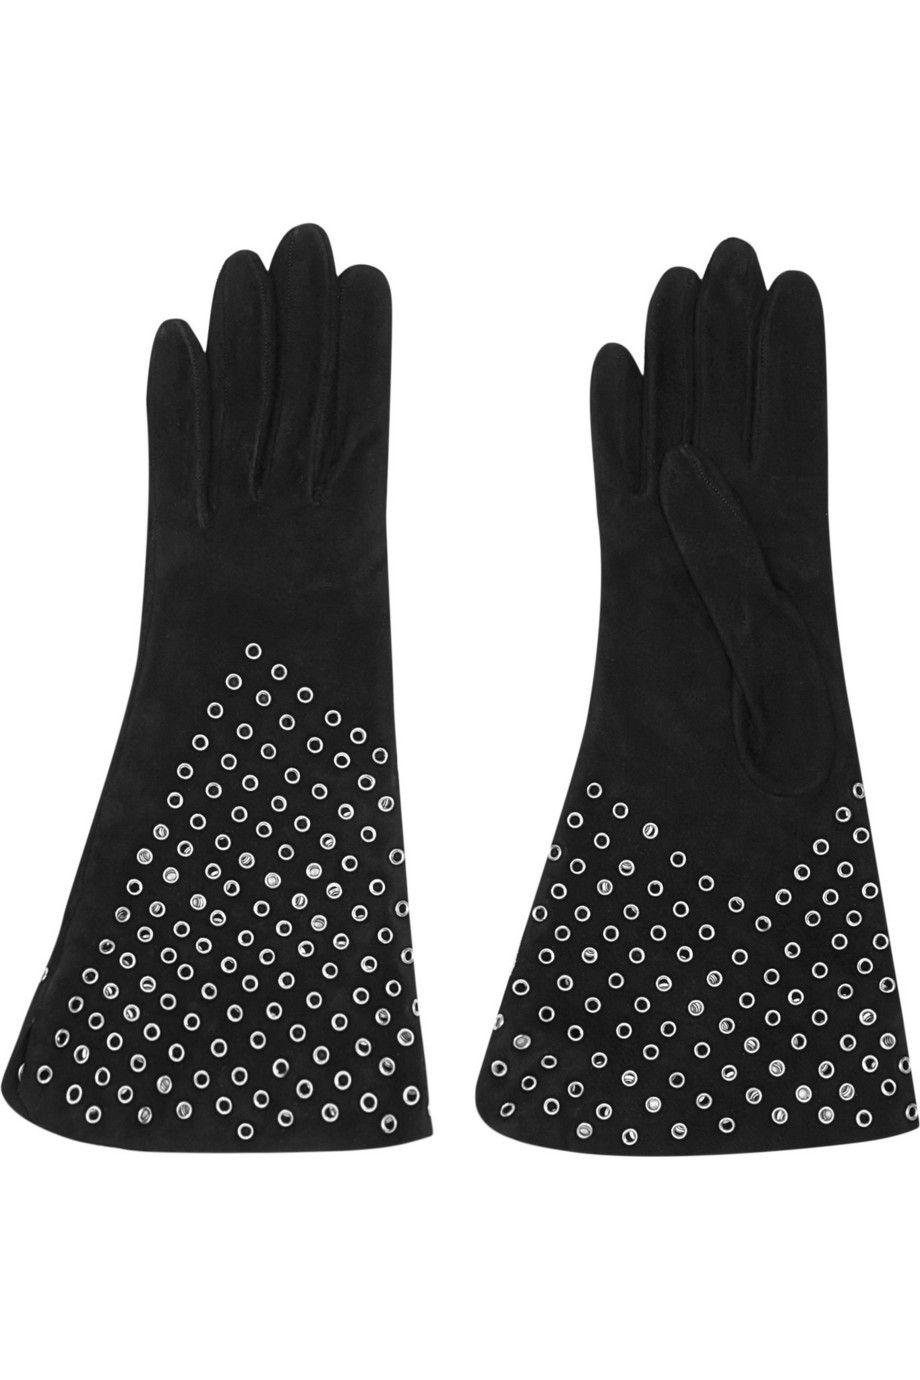 Evening-Gloves-1115